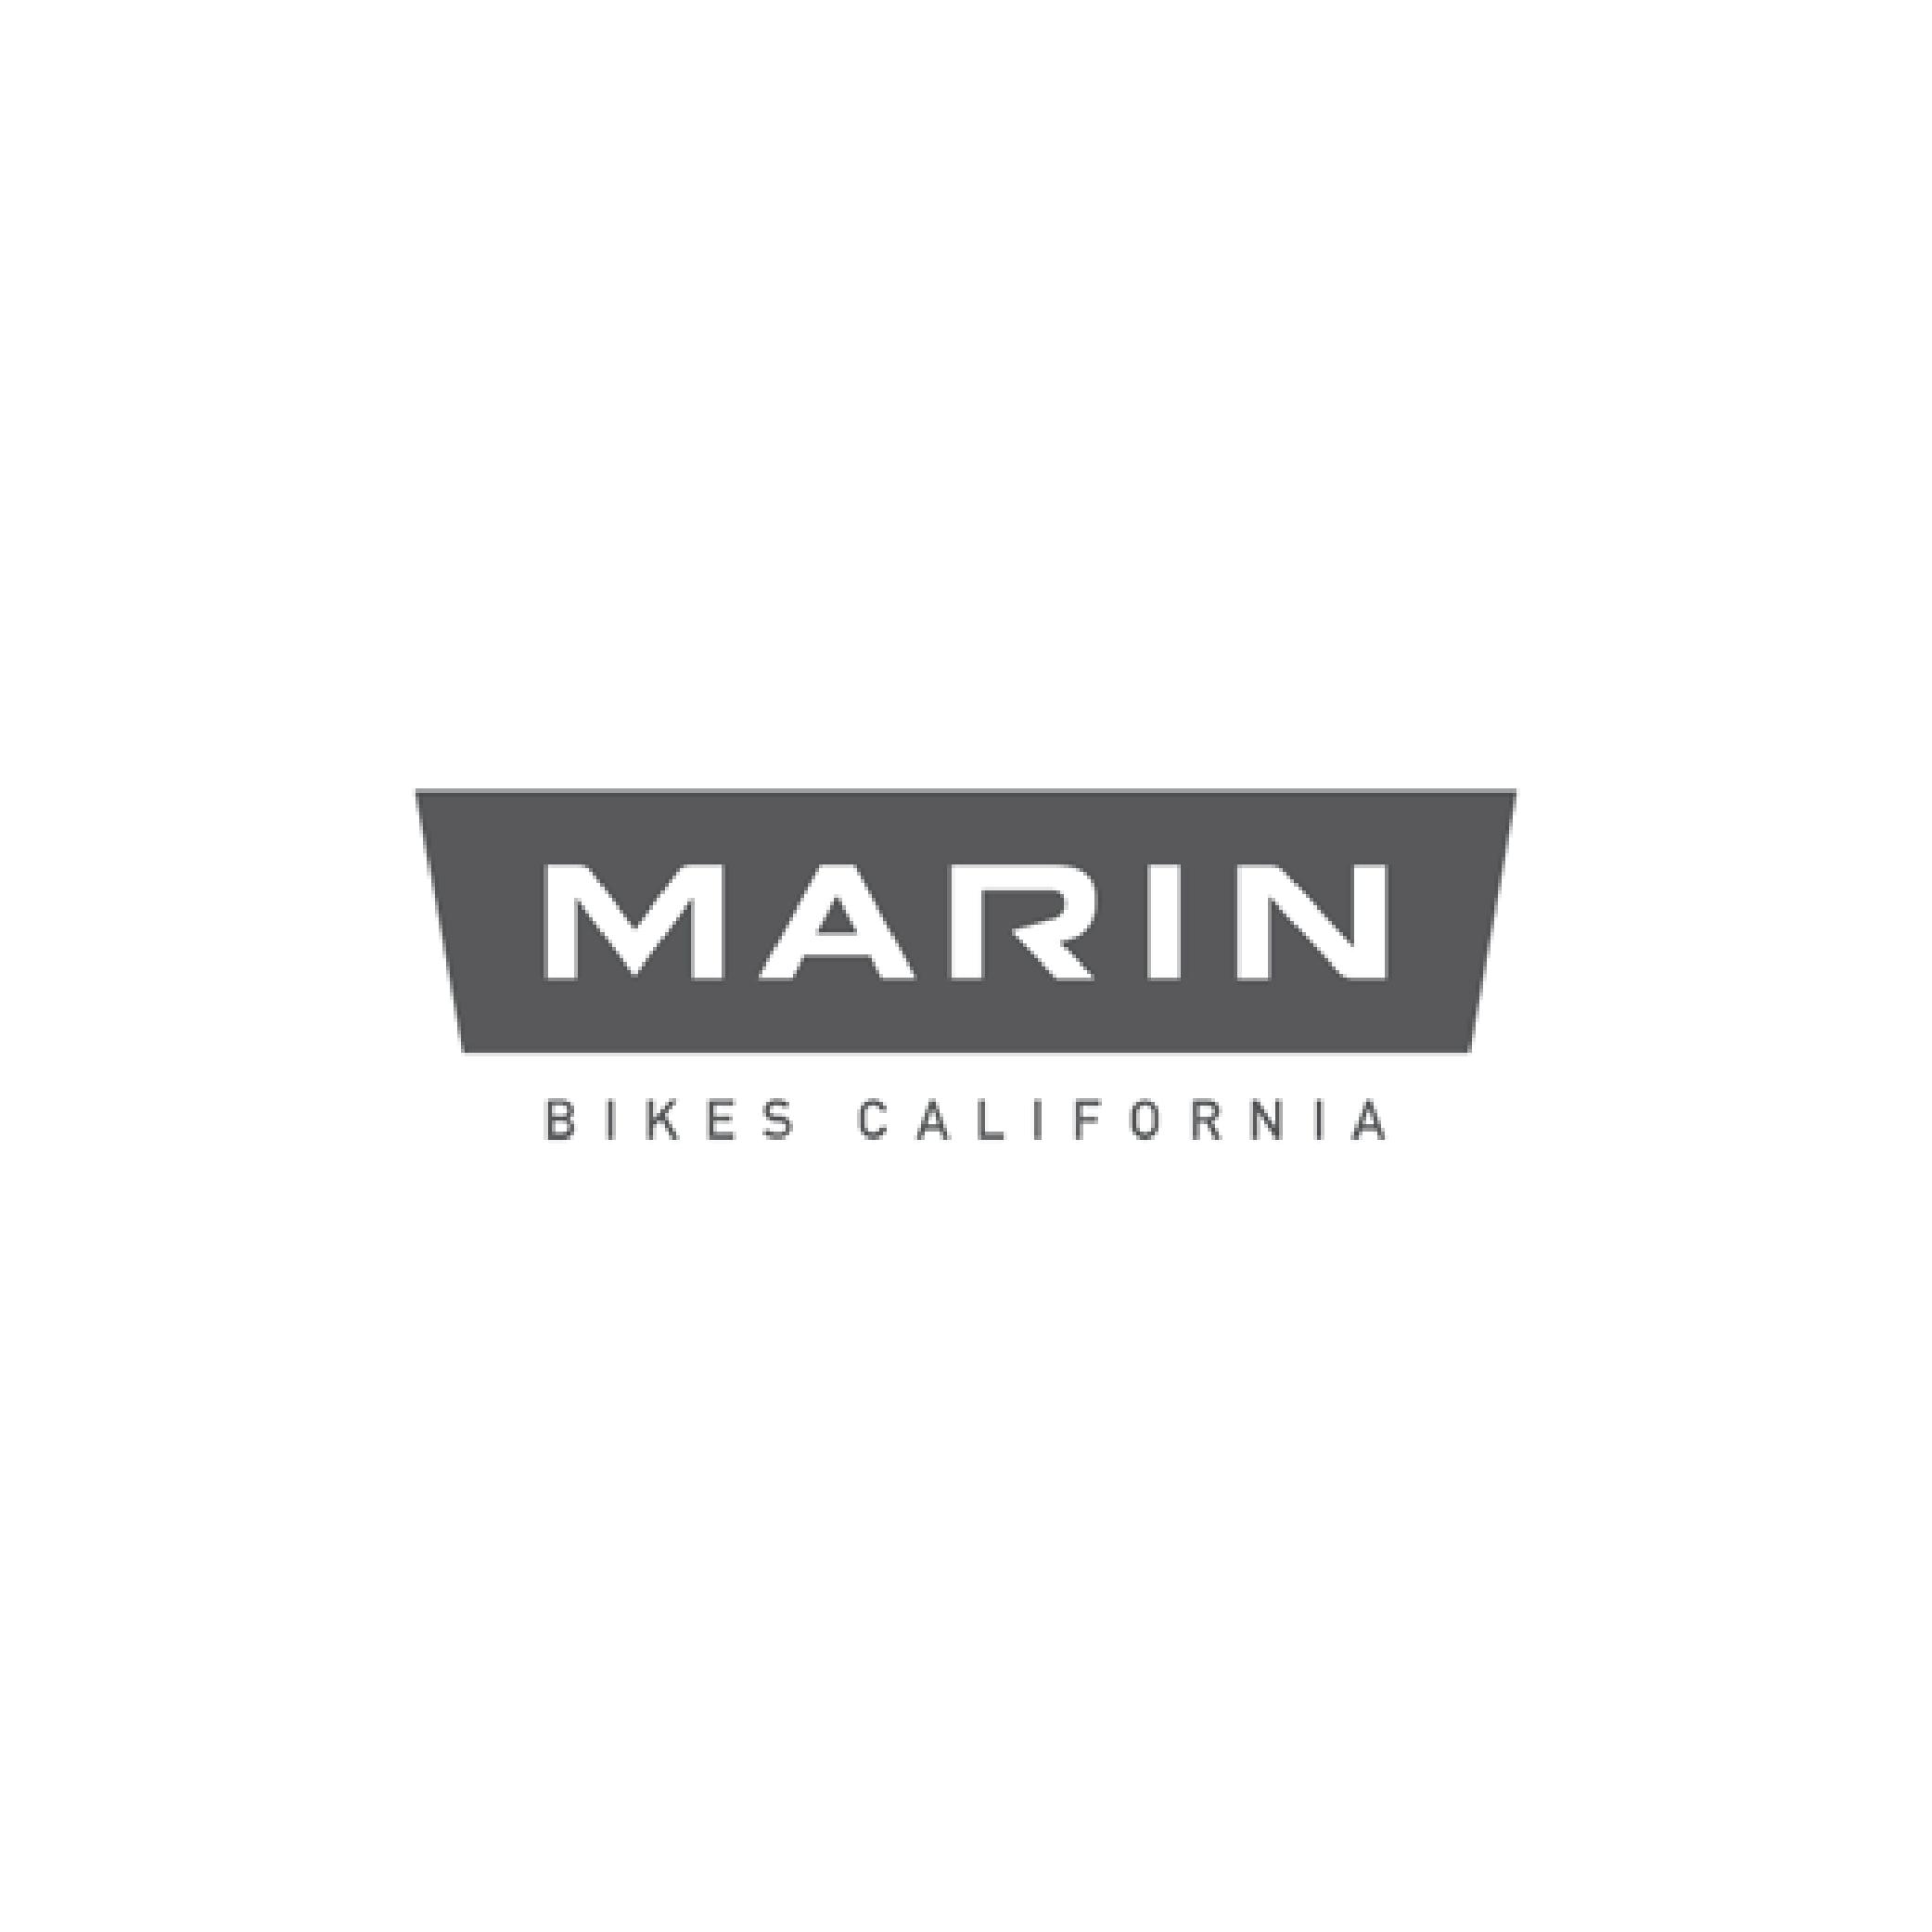 marin.png